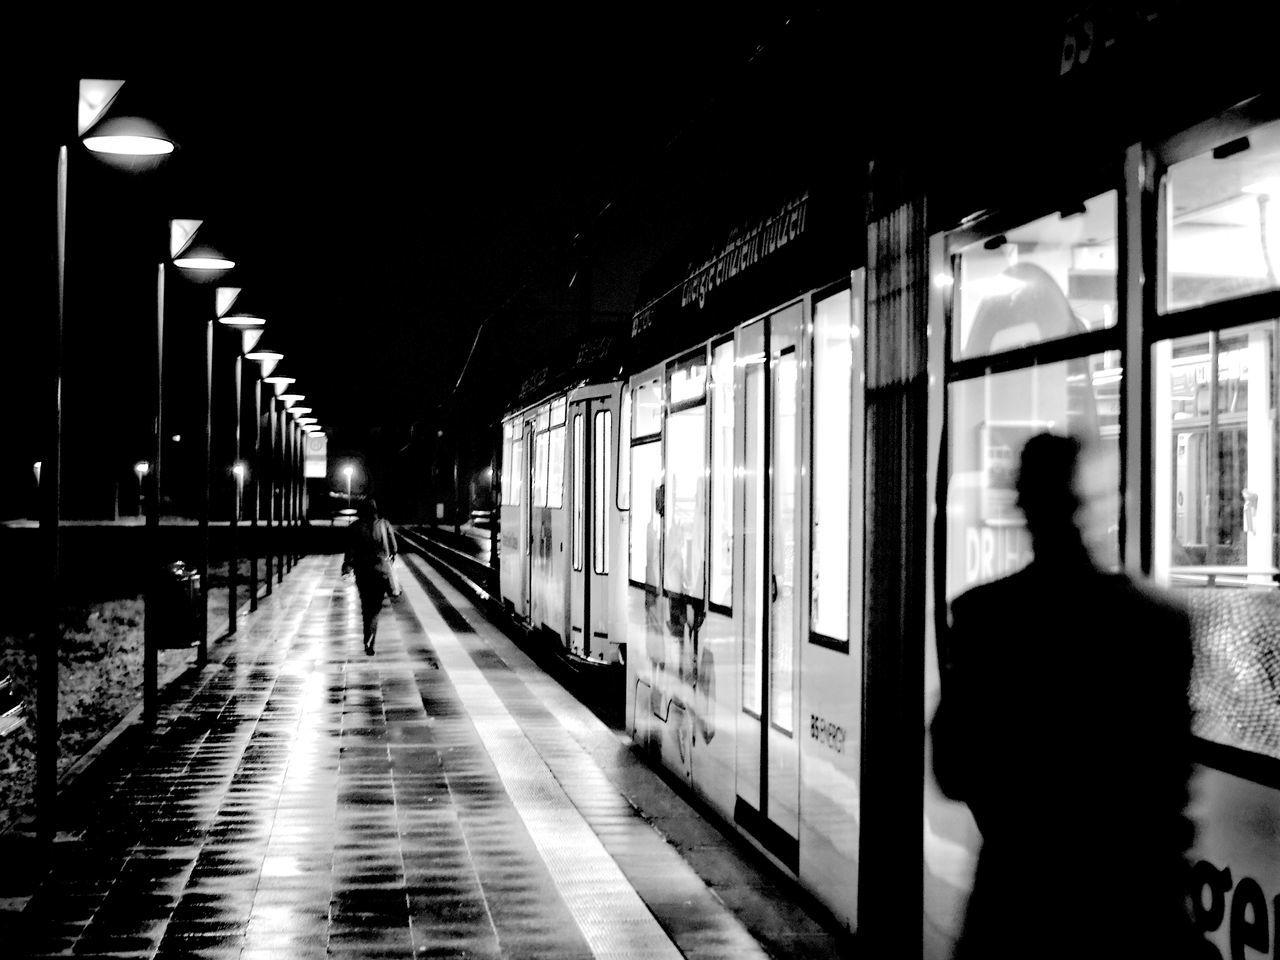 transportation, public transportation, illuminated, train - vehicle, mode of transport, rail transportation, real people, railroad station platform, night, men, indoors, one person, people